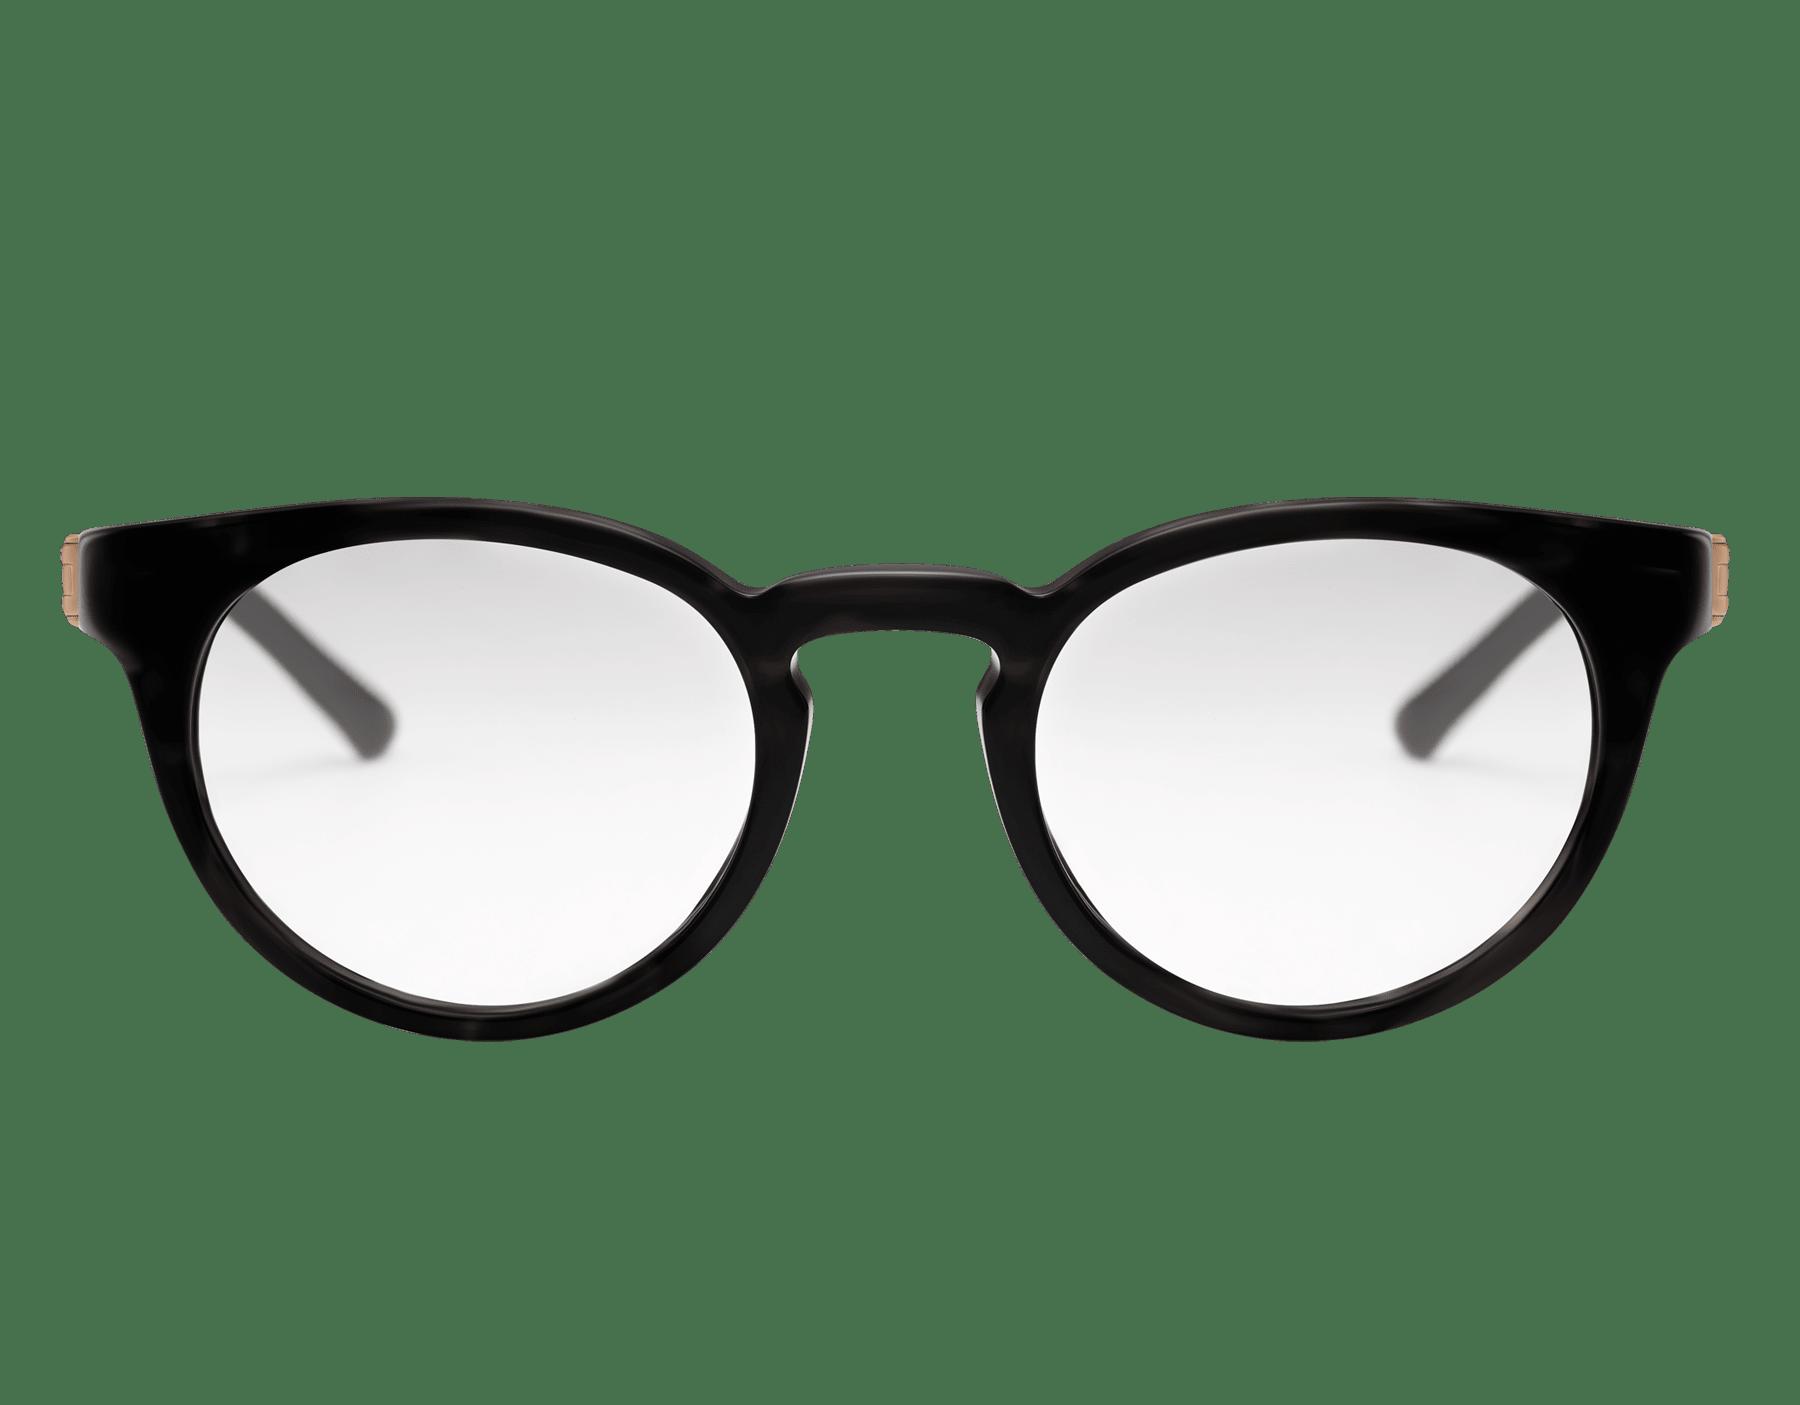 Diagono 圓形醋酸纖維鏡架。 903923 image 2